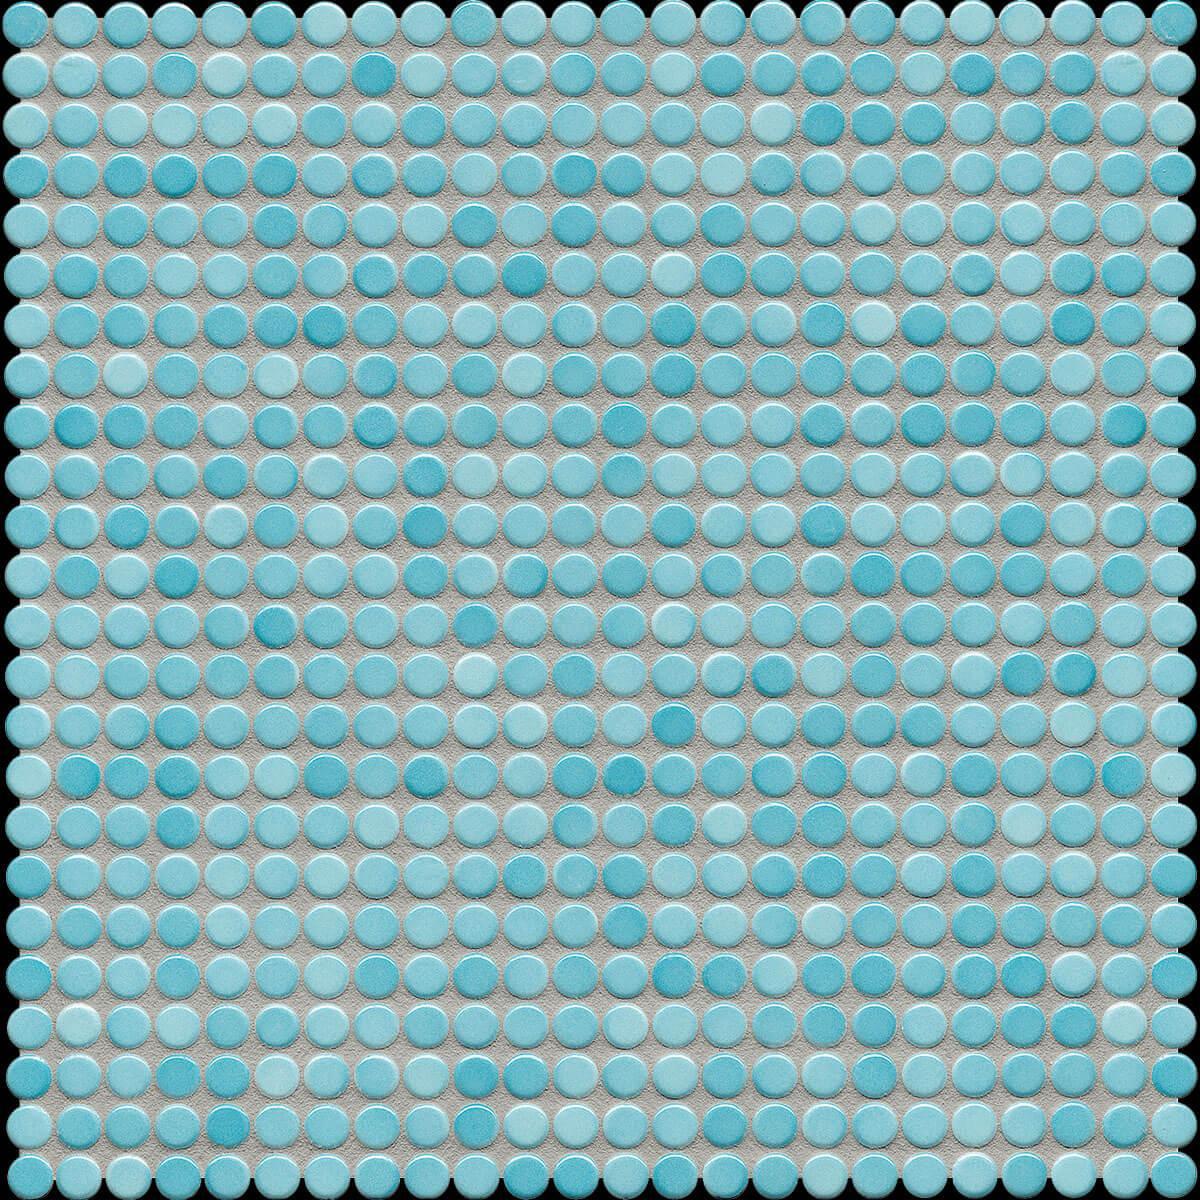 Agrob Buchtal Tiles - KLAY_Loop-_0006_40008H